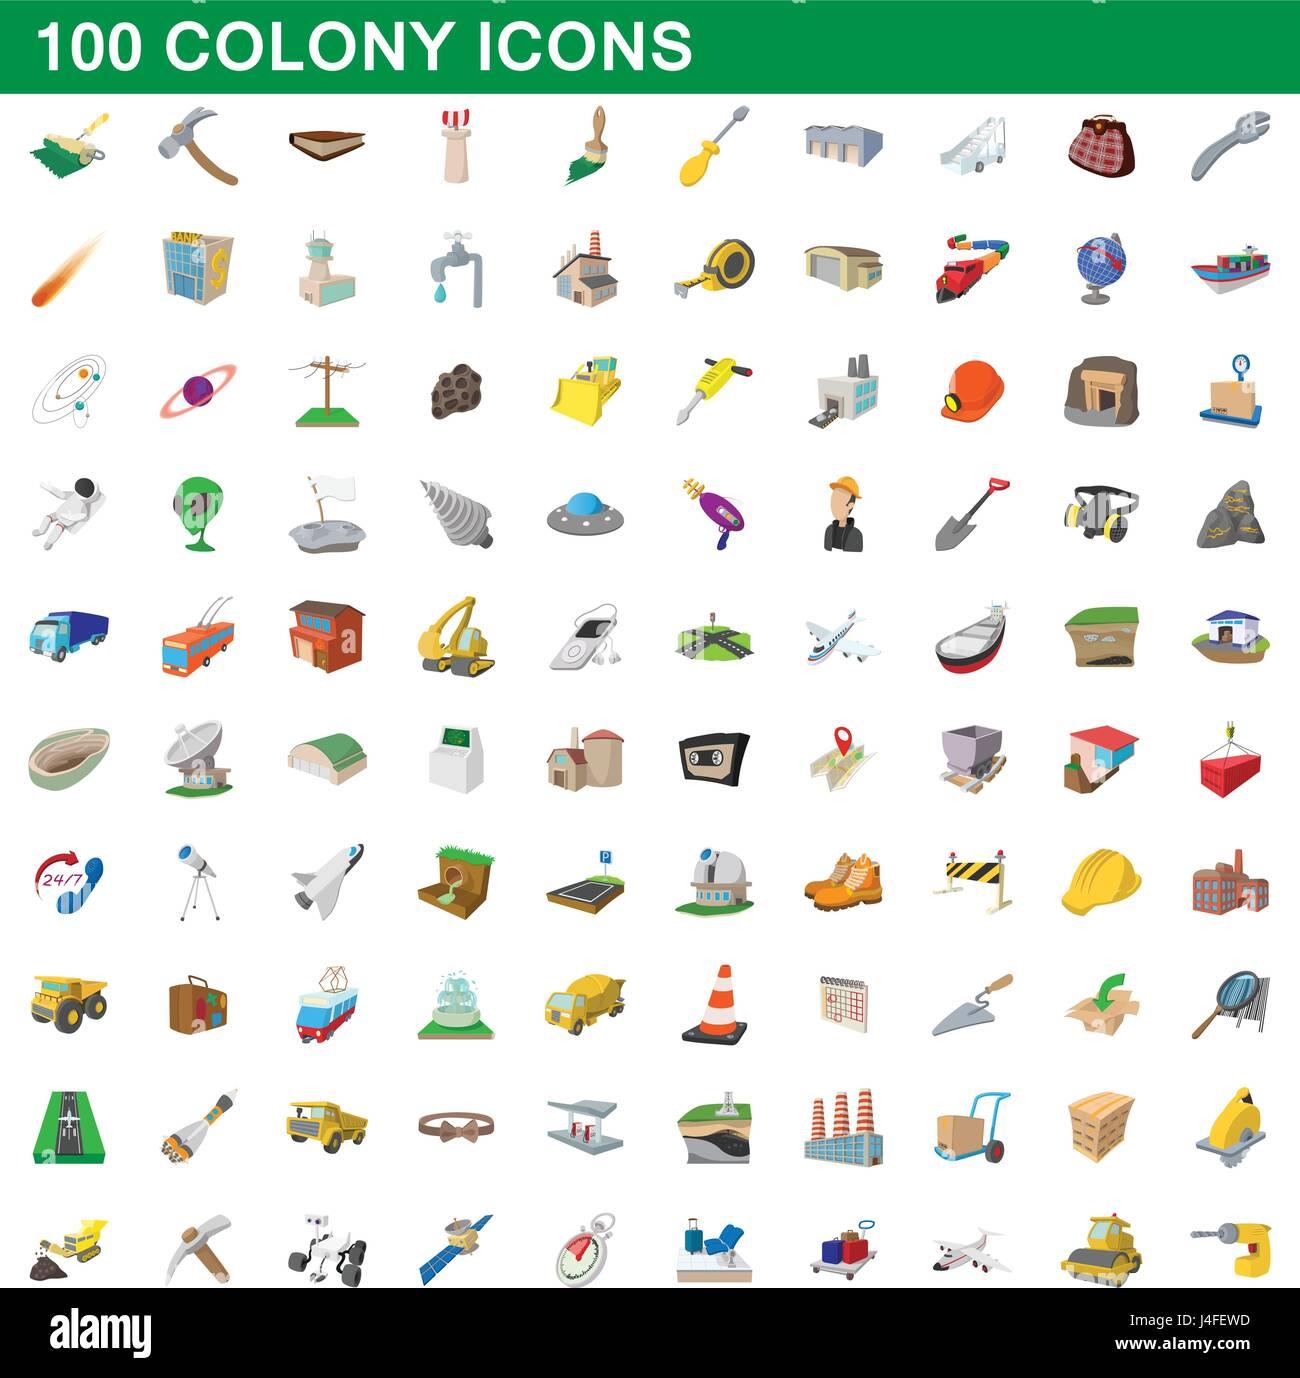 100 colony icons set, cartoon style - Stock Vector